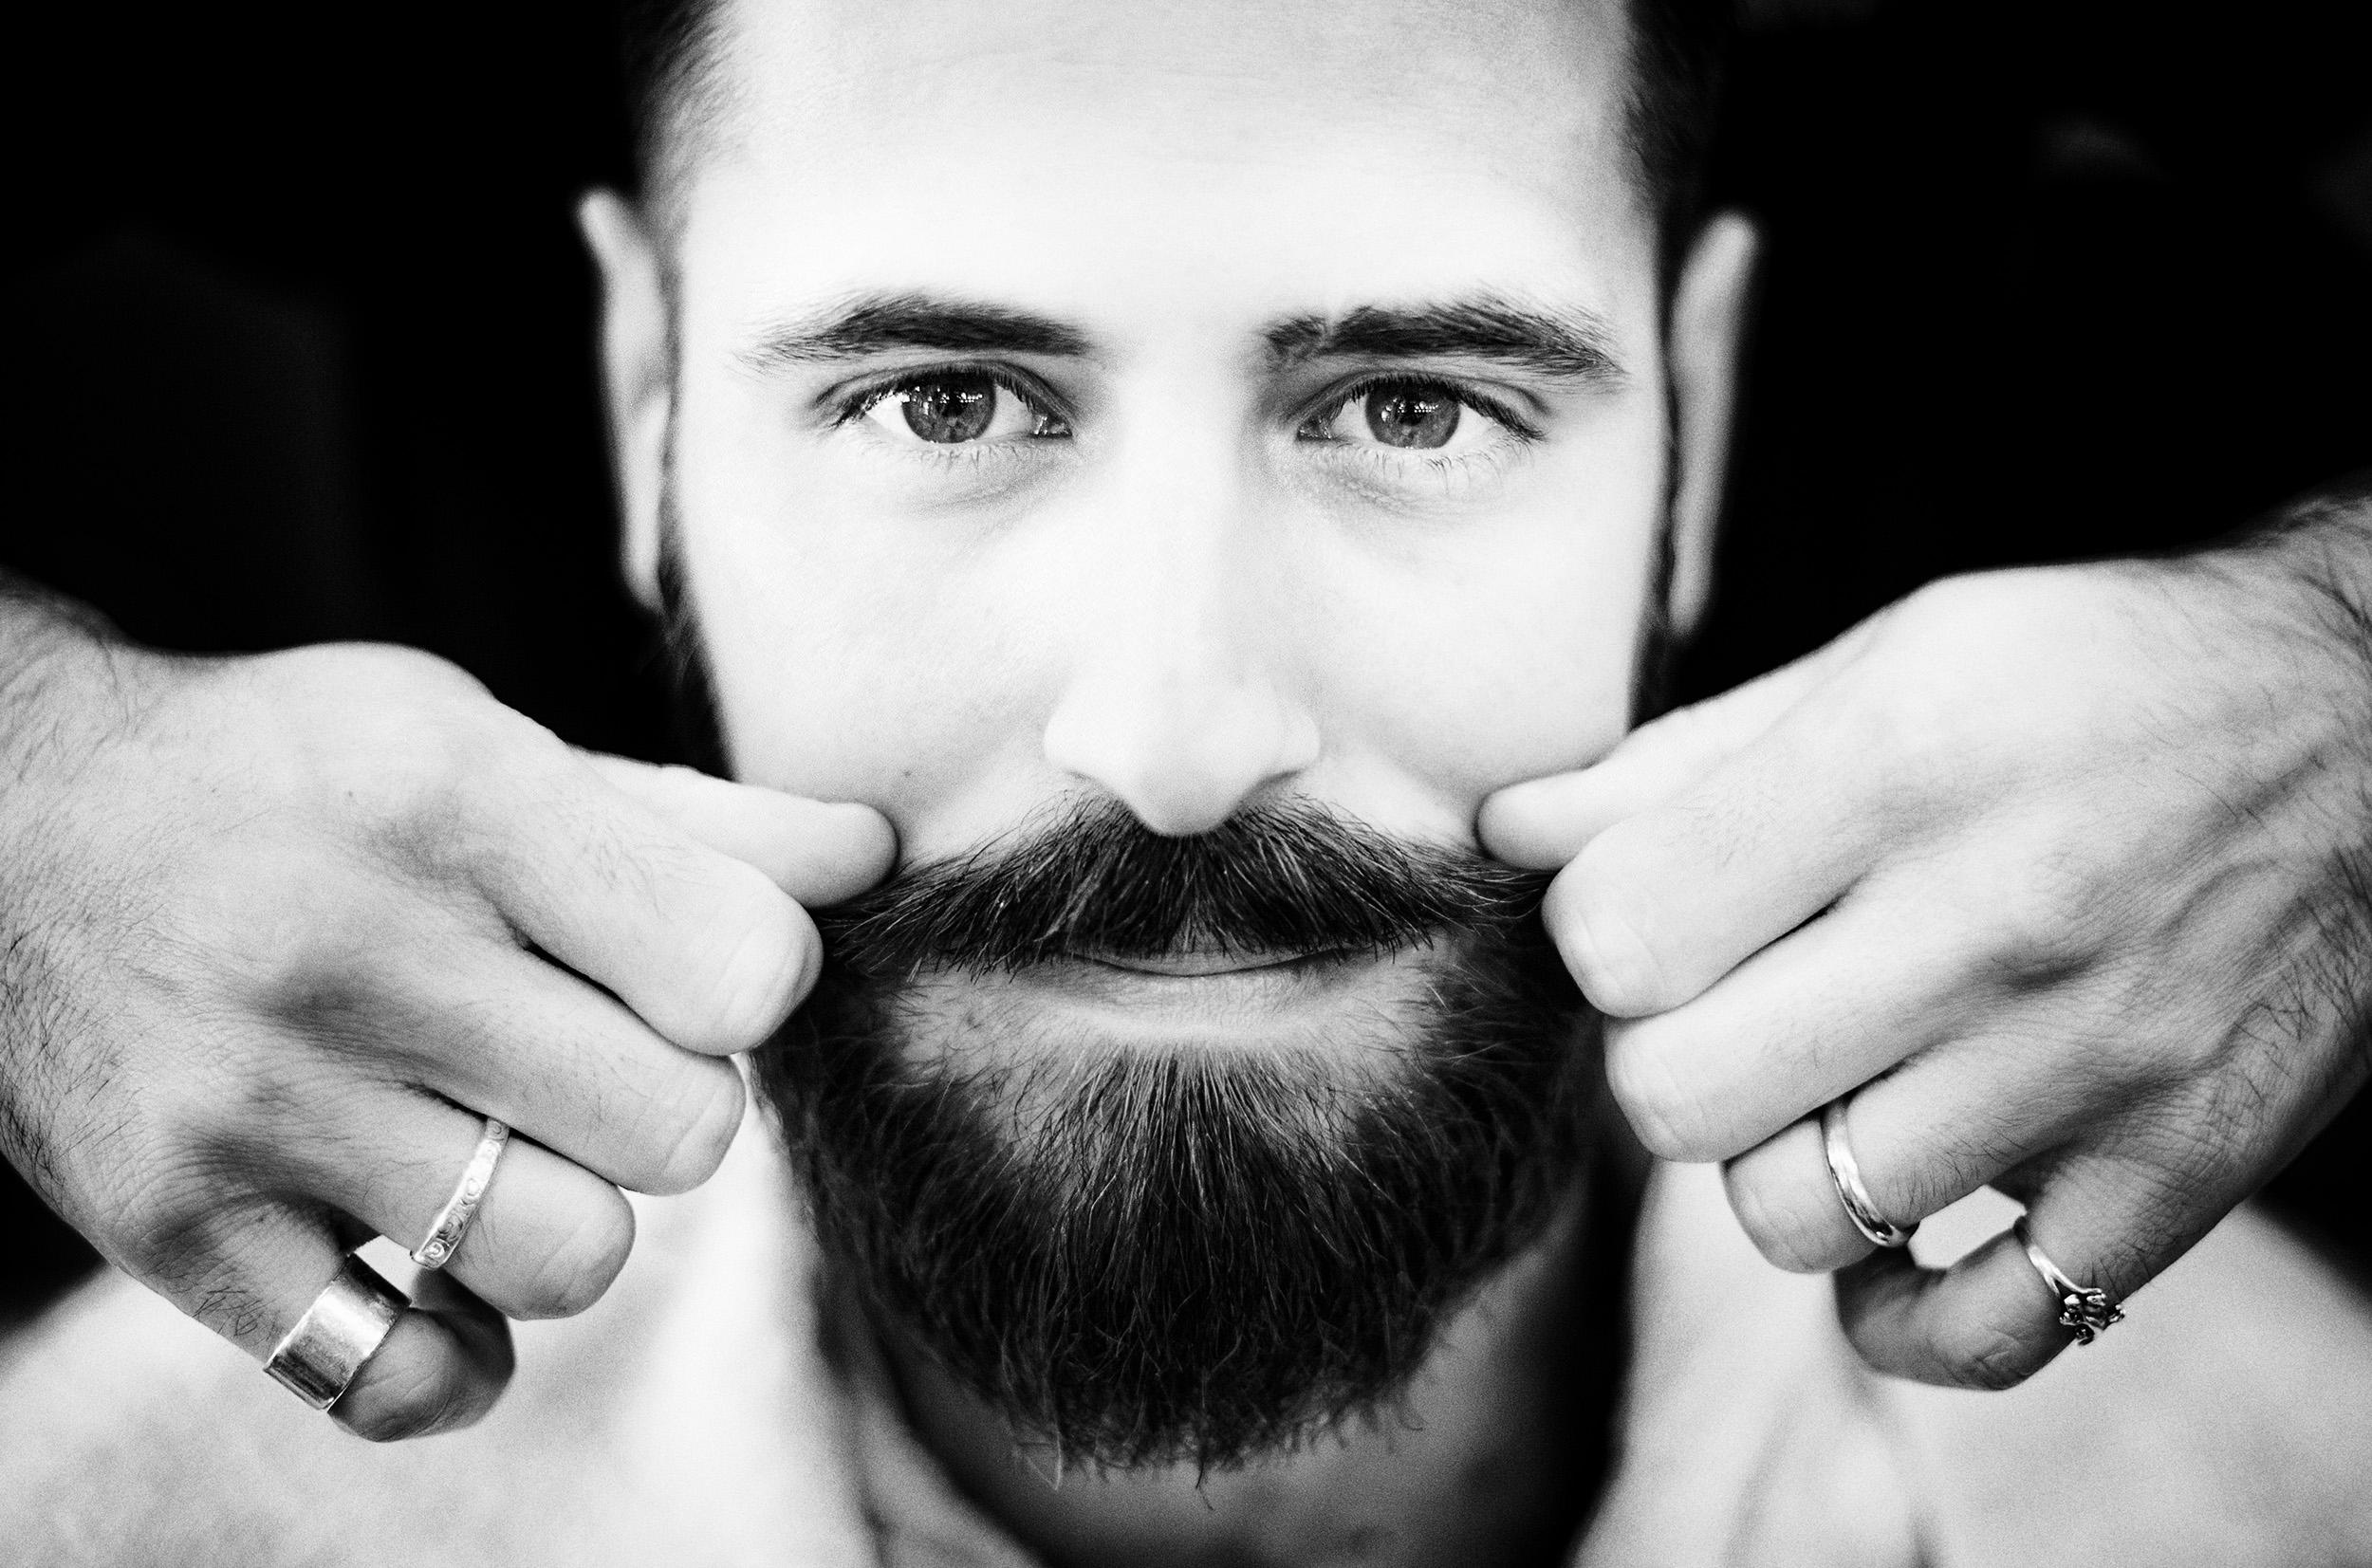 Marco's mustache